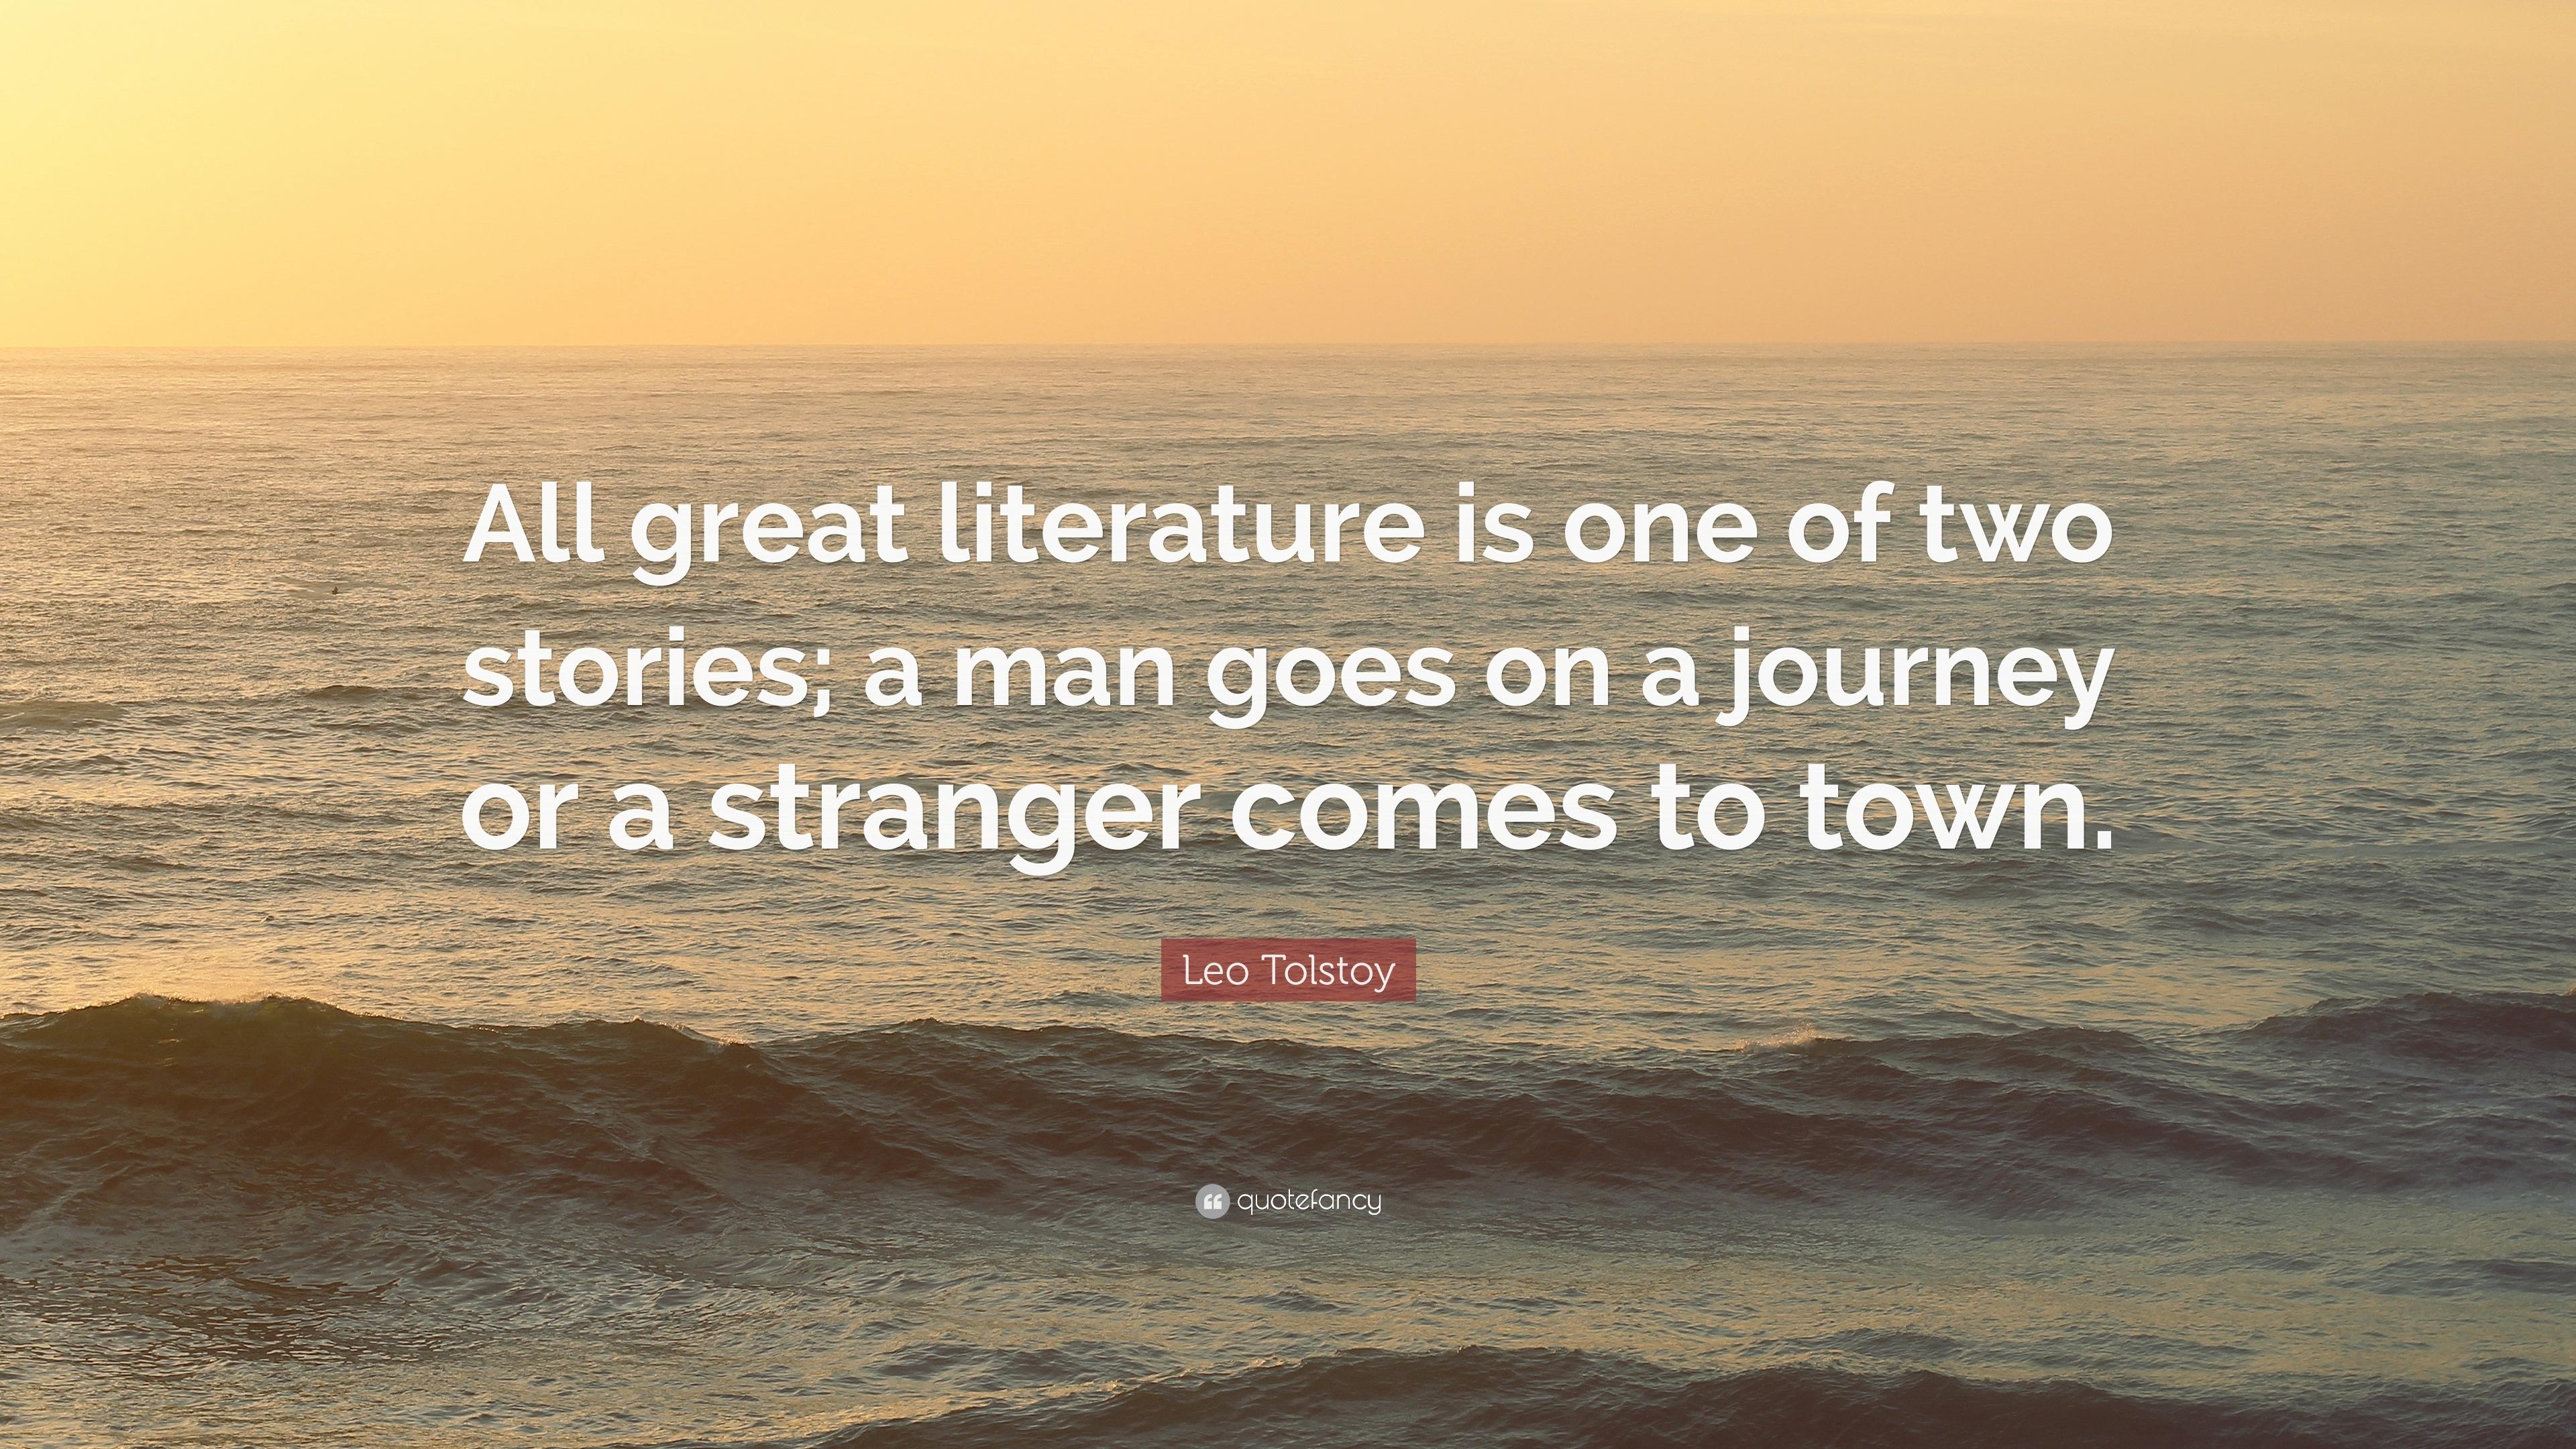 Journey Synonyms, Journey Antonyms | Thesaurus.com